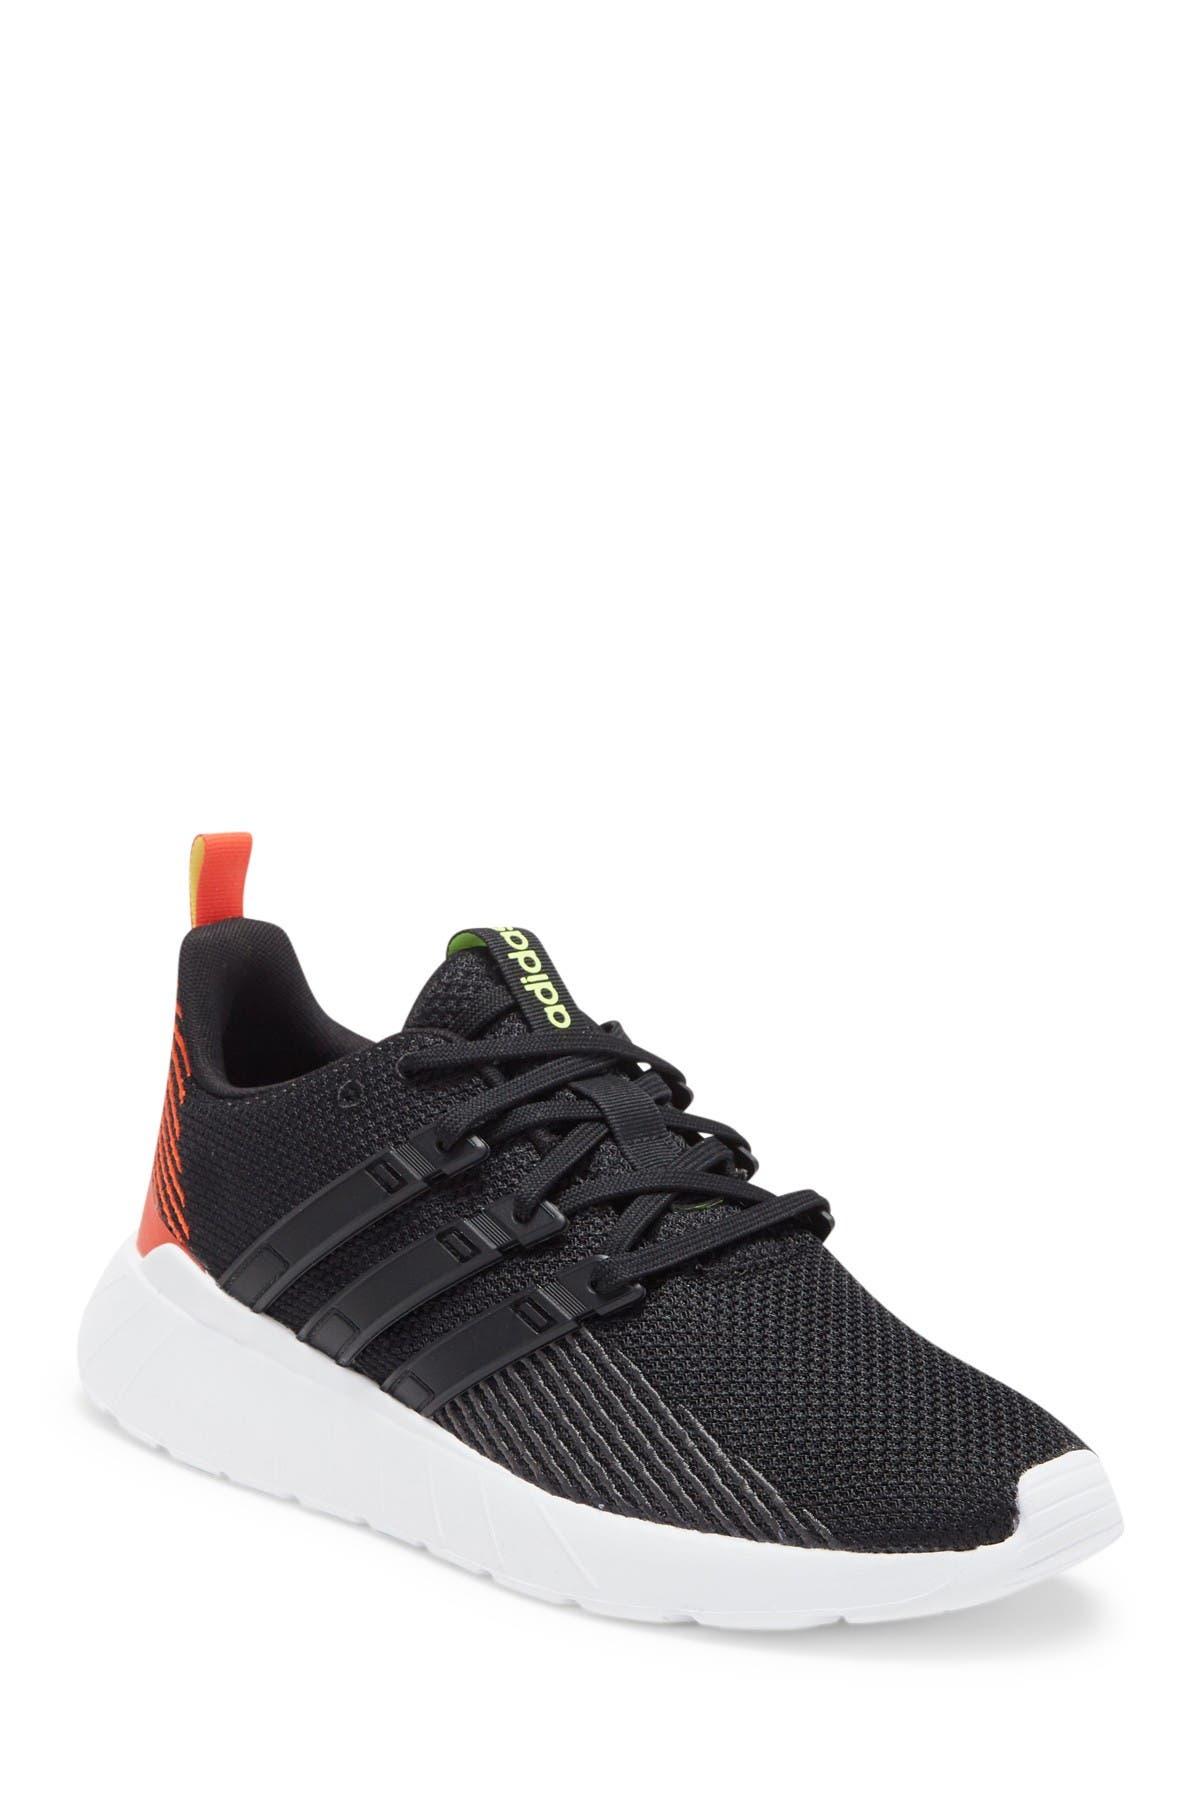 adidas   Questar Flow Sneaker